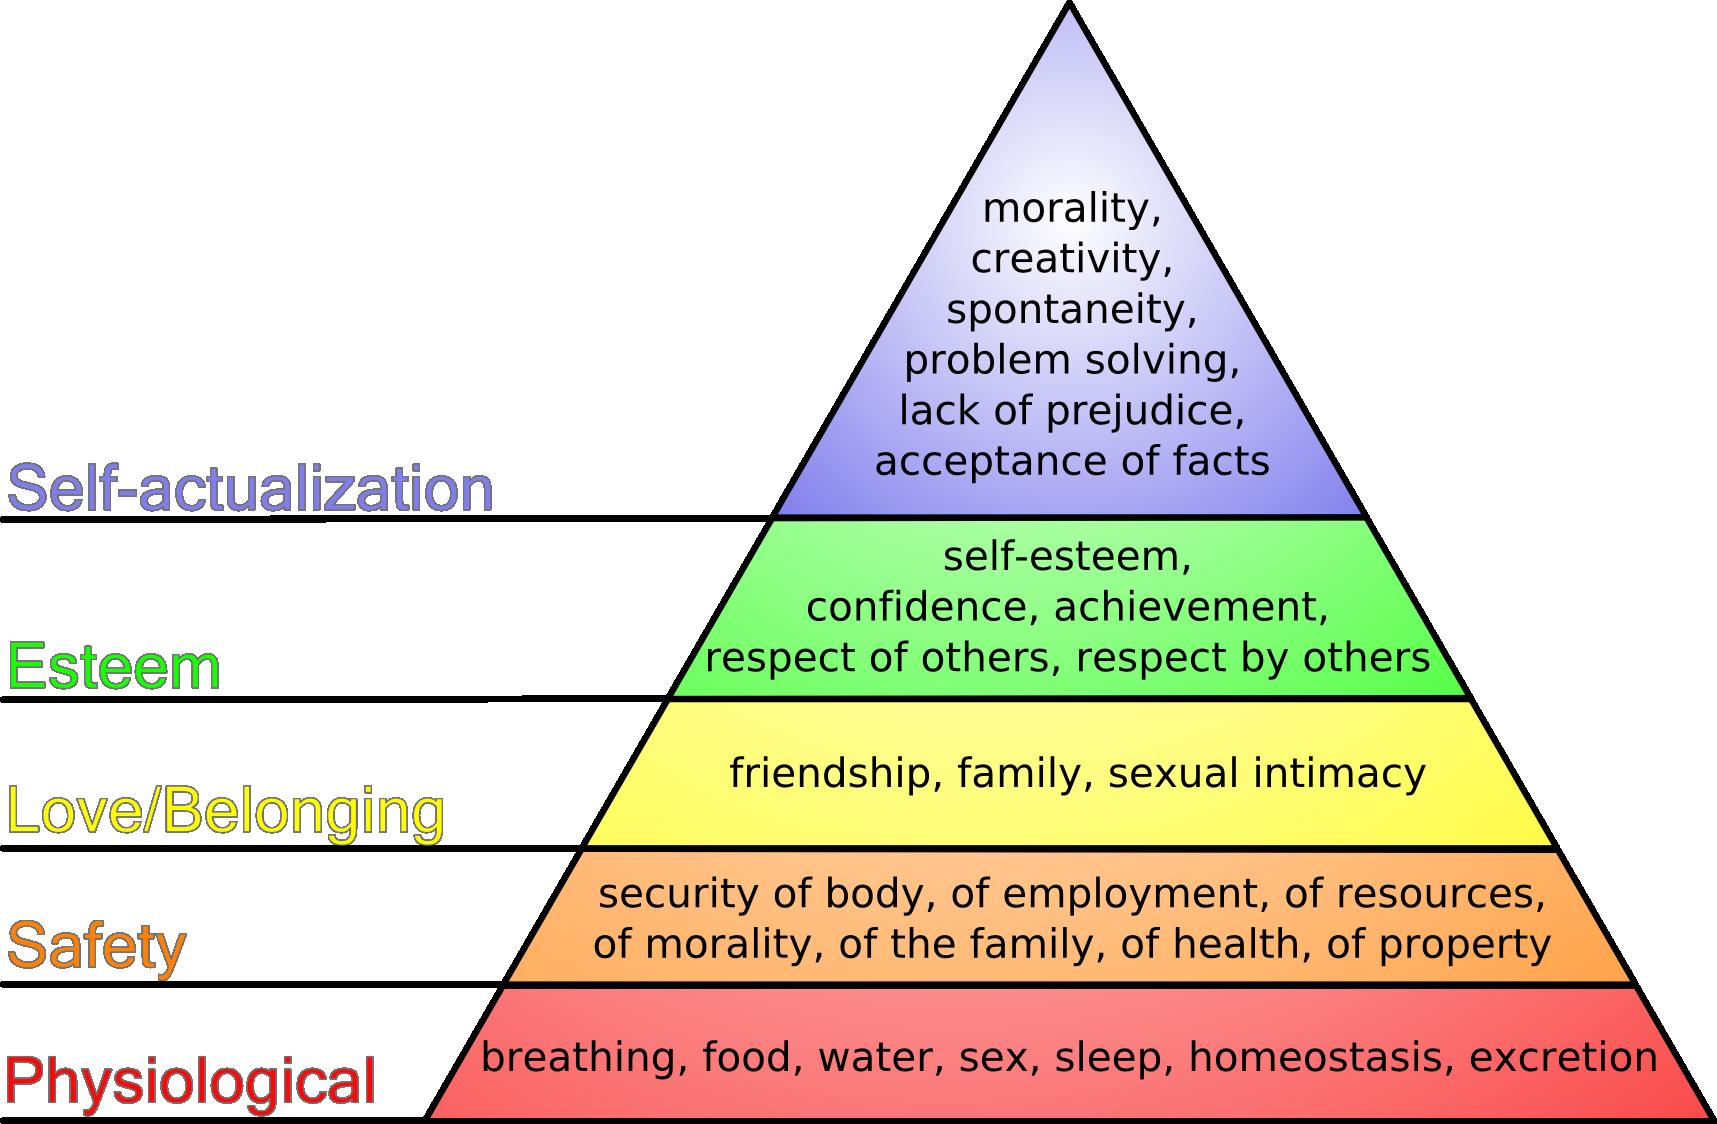 maslow motivation and personality 1987 pdf